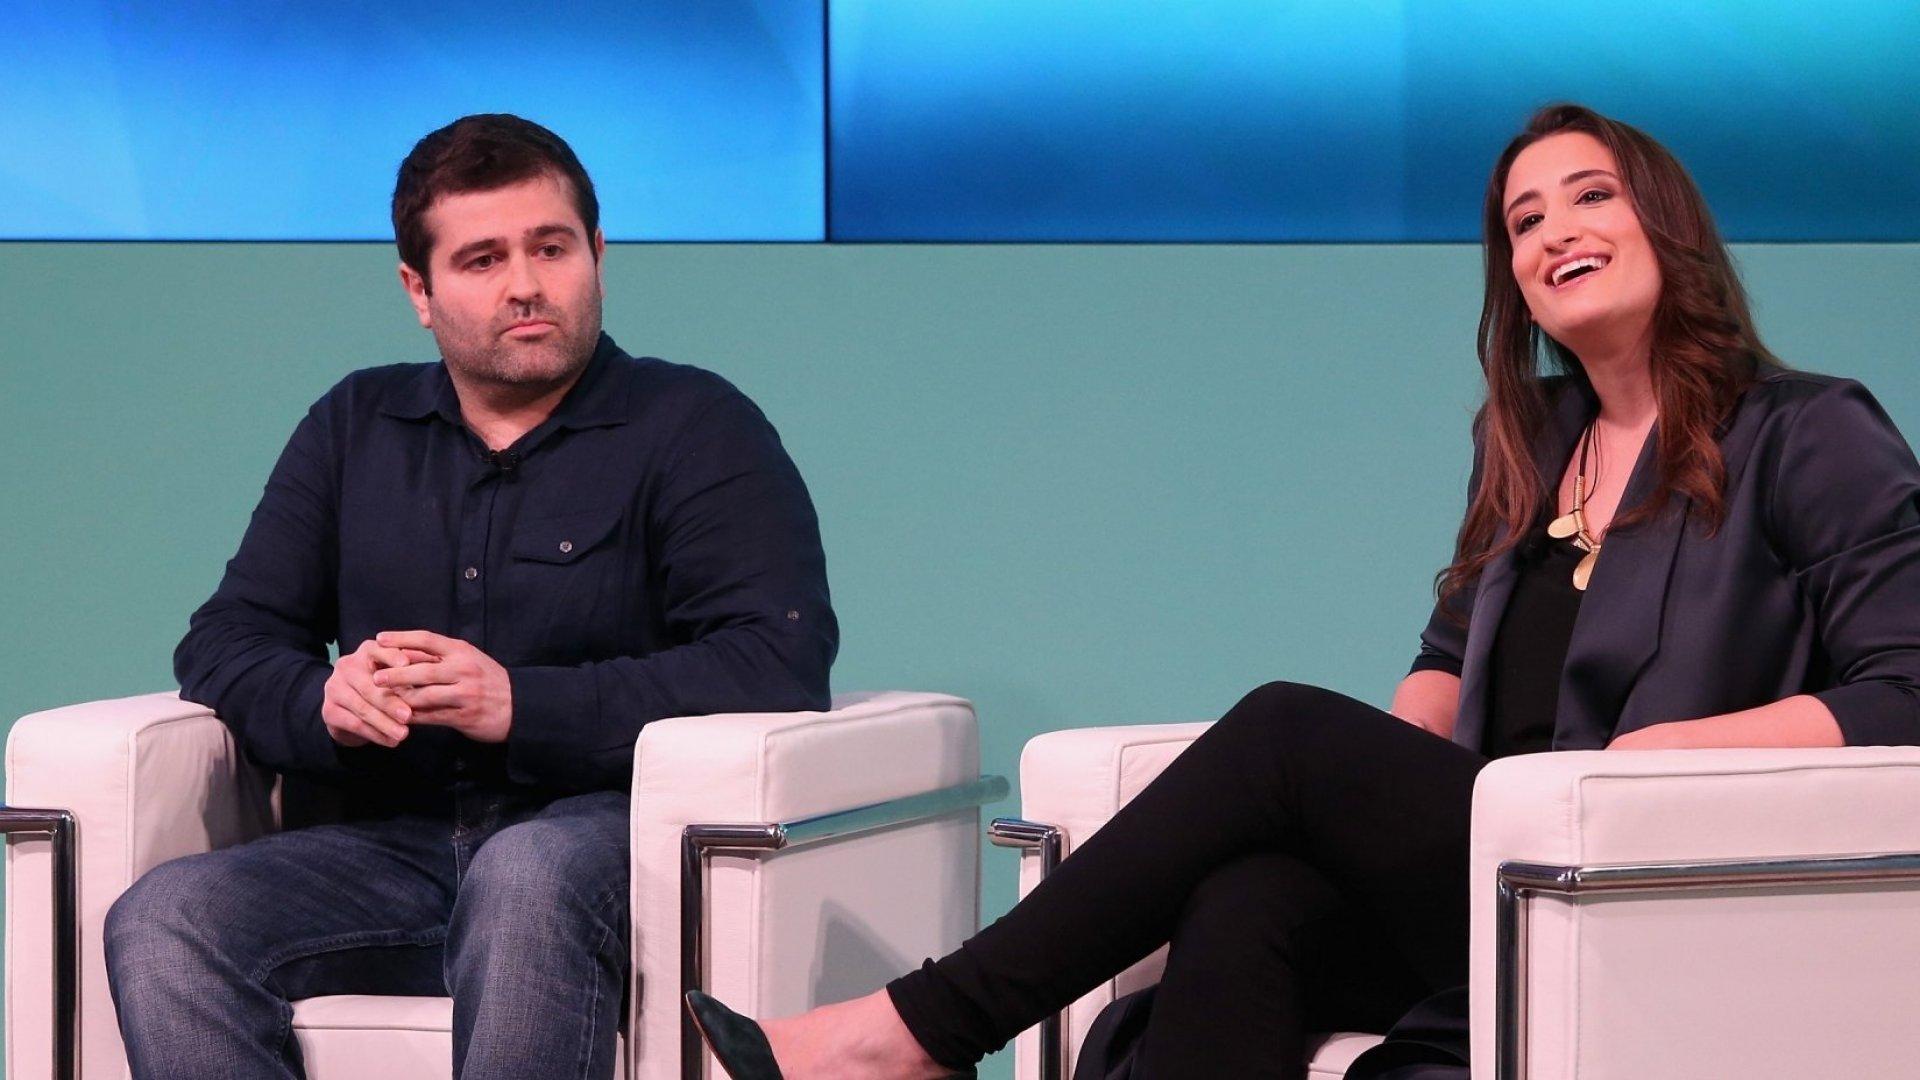 Slava Rubin, co-founder of Indiegogo, and Hayley Barna, a co-founder of Birchbox.